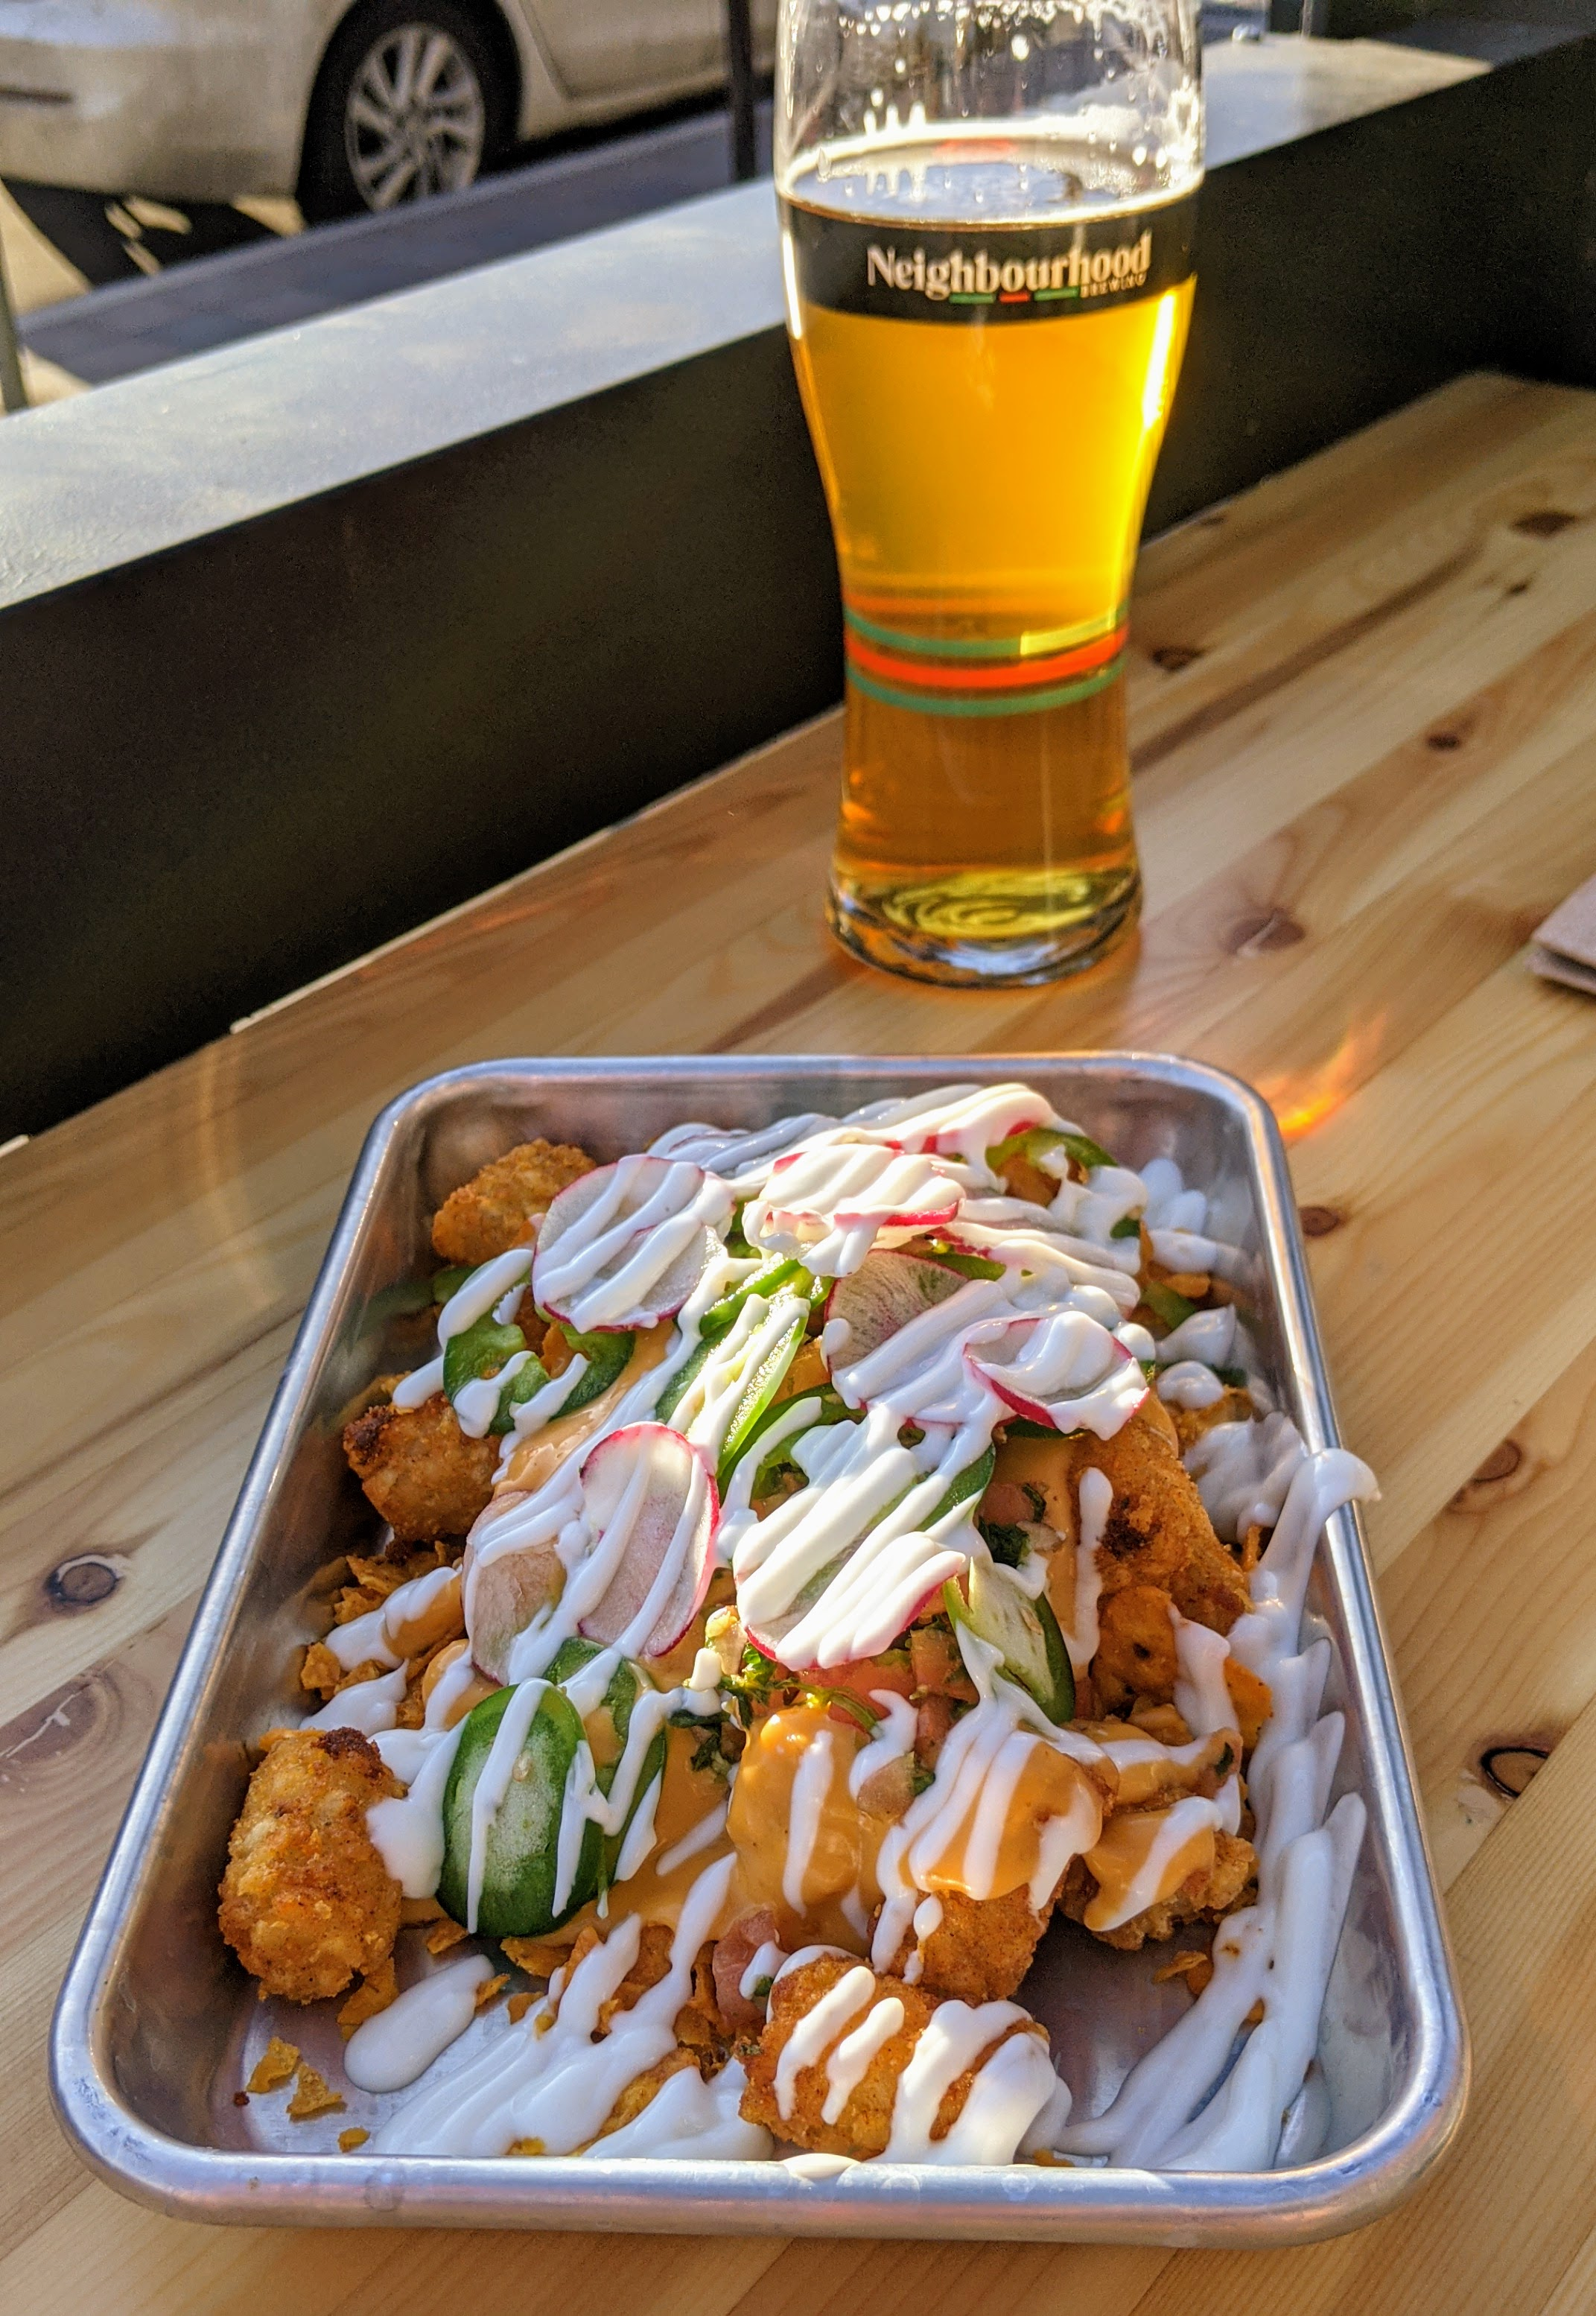 Tatchos (tater tot nachos) at Neighbourhood Brewing